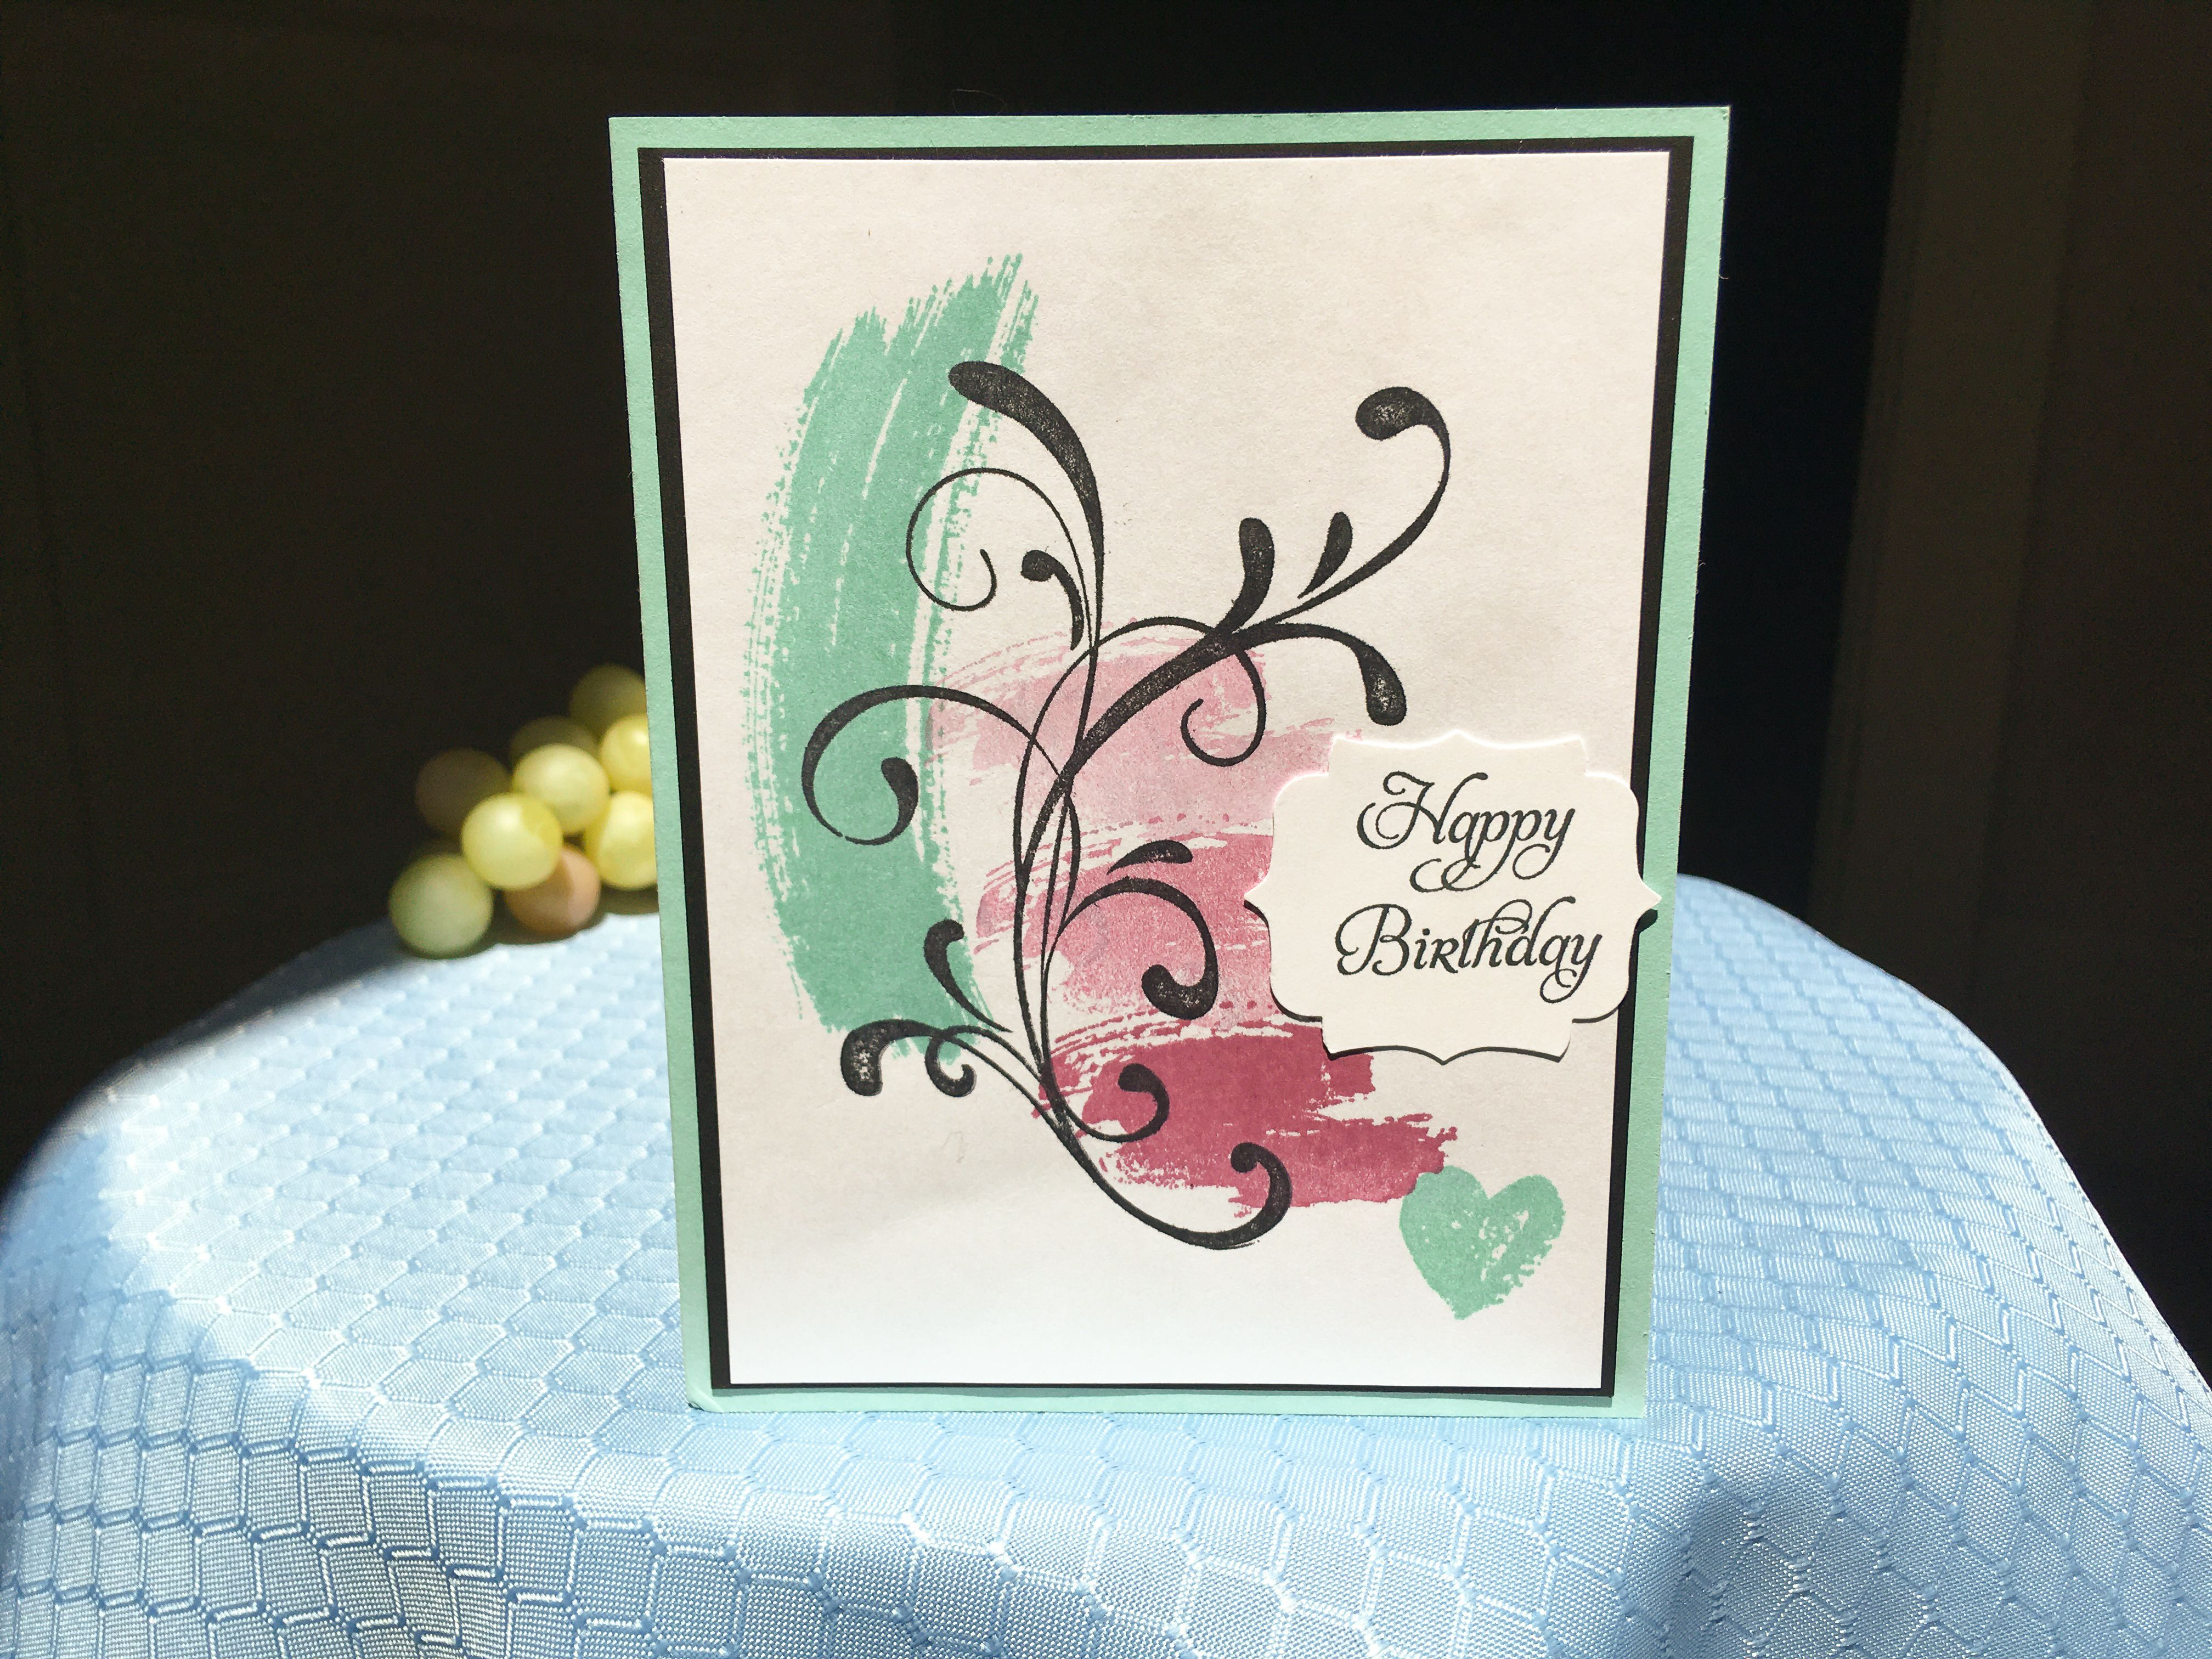 Happy Birthday Card Happy Birthday Cards Birthday Cards Greeting Cards Handmade